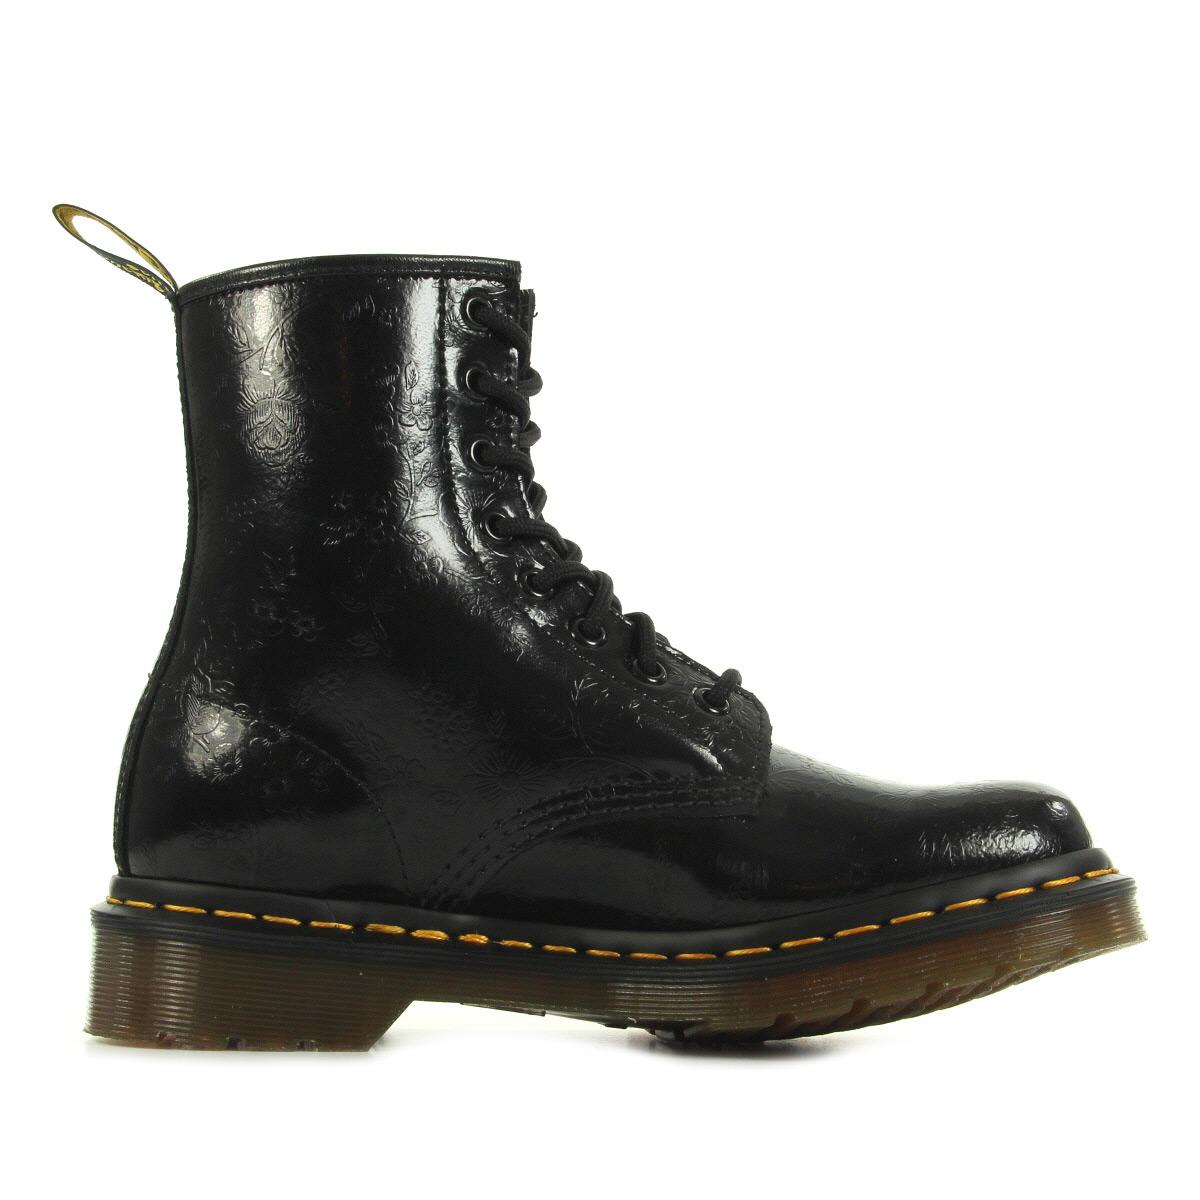 dr martens 1460 black qq flowers 11821018 chaussures homme homme. Black Bedroom Furniture Sets. Home Design Ideas